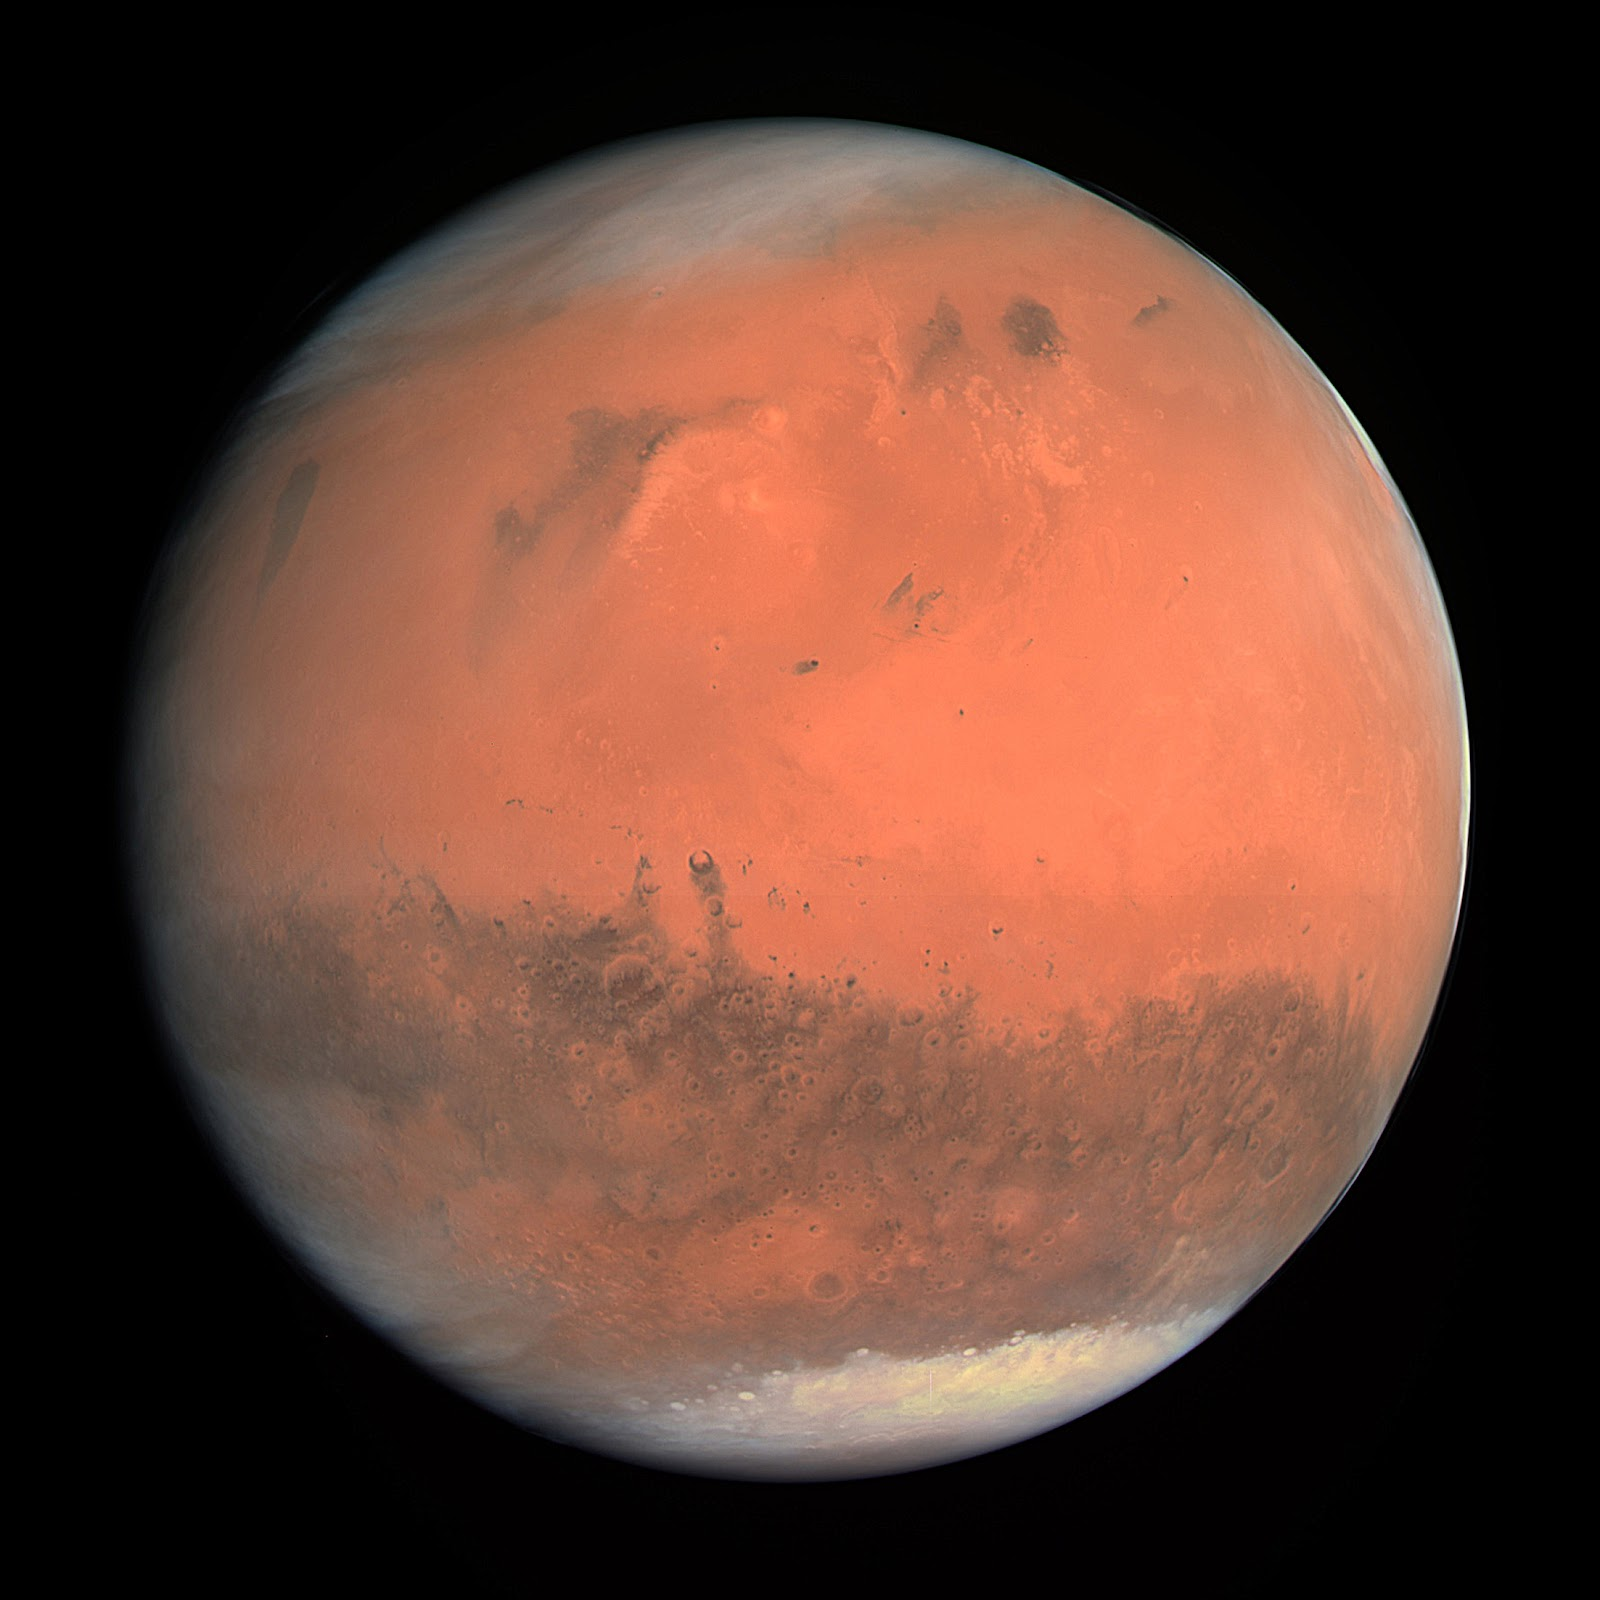 https://upload.wikimedia.org/wikipedia/commons/0/02/OSIRIS_Mars_true_color.jpg